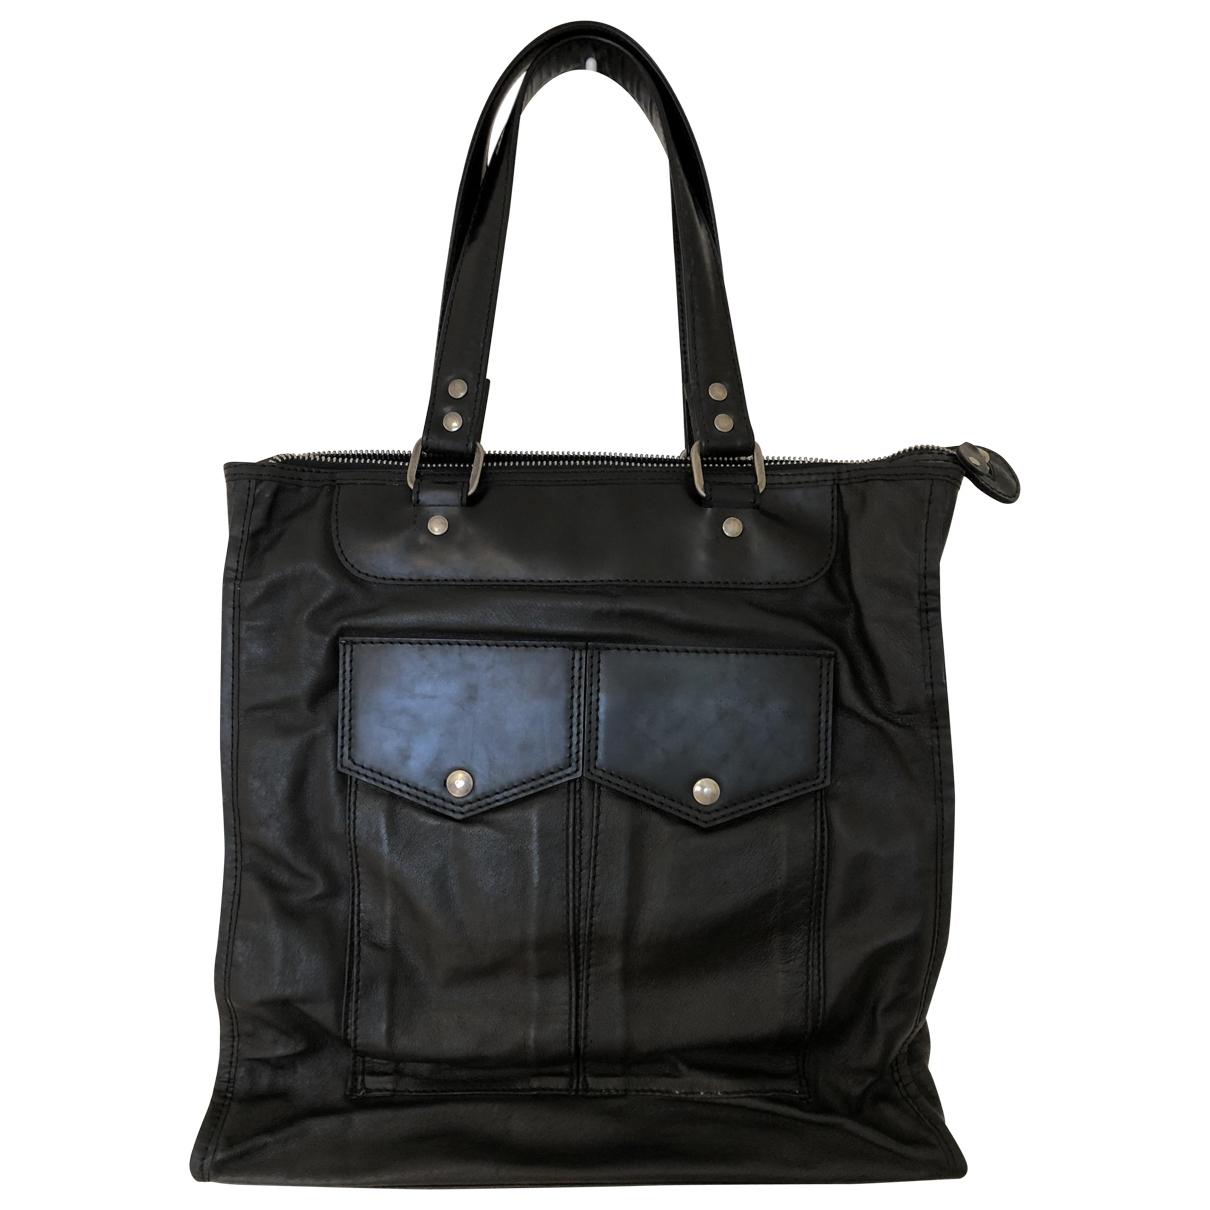 Maison Martin Margiela \N Black Leather bag for Men \N